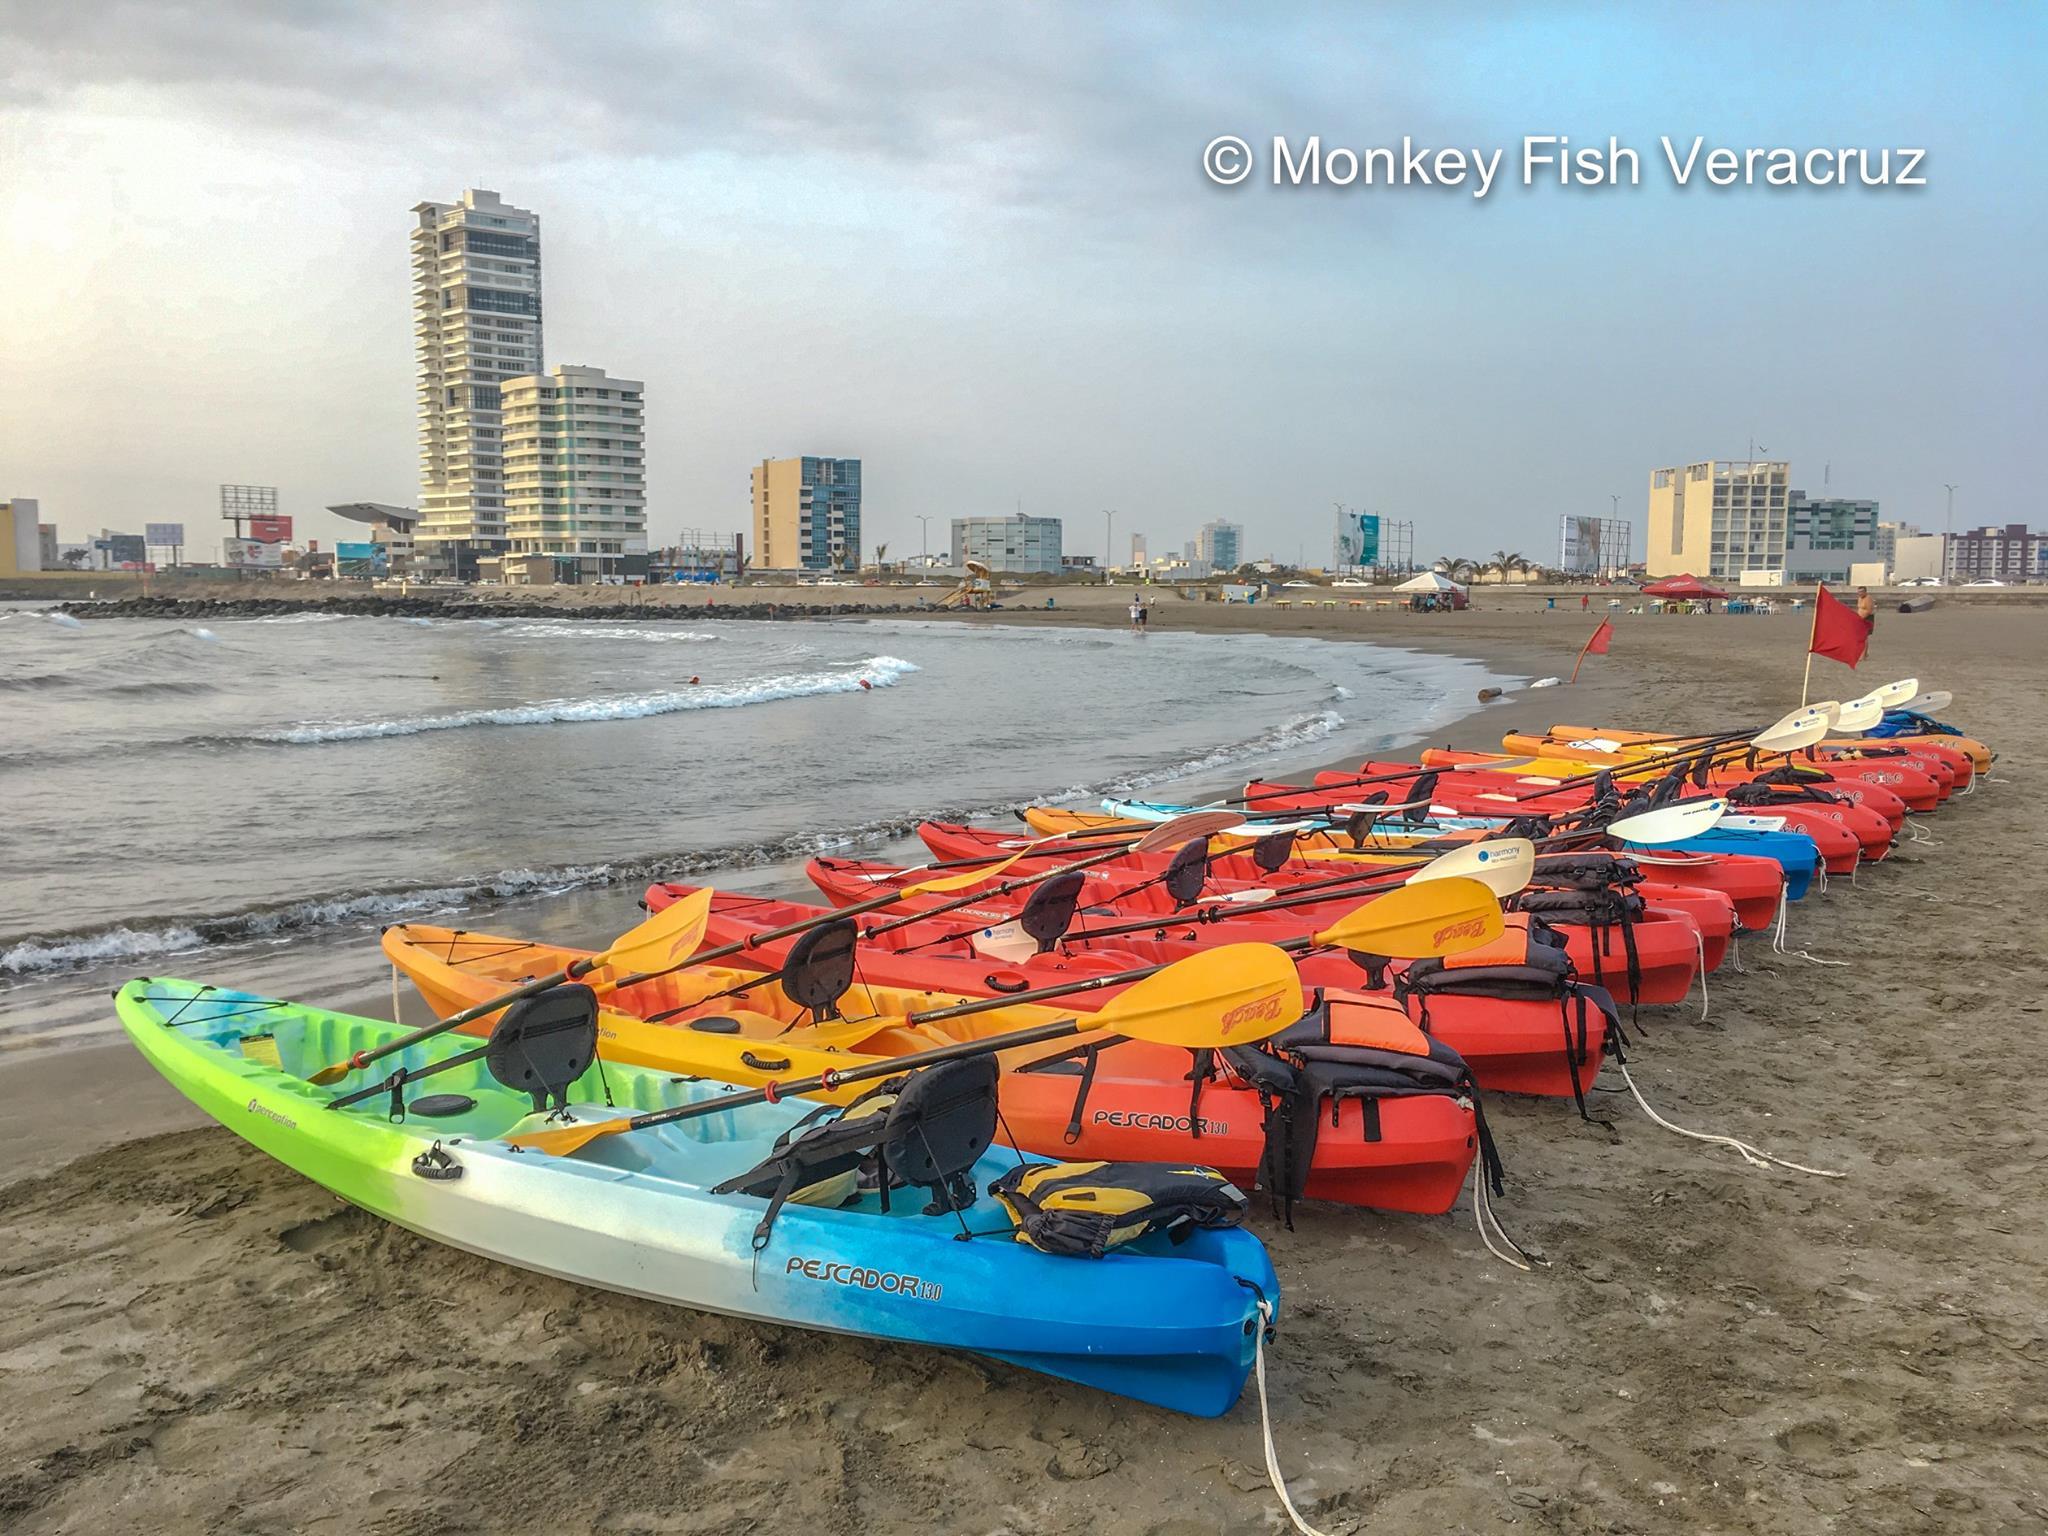 Renta-kayaks-veracruz-playa